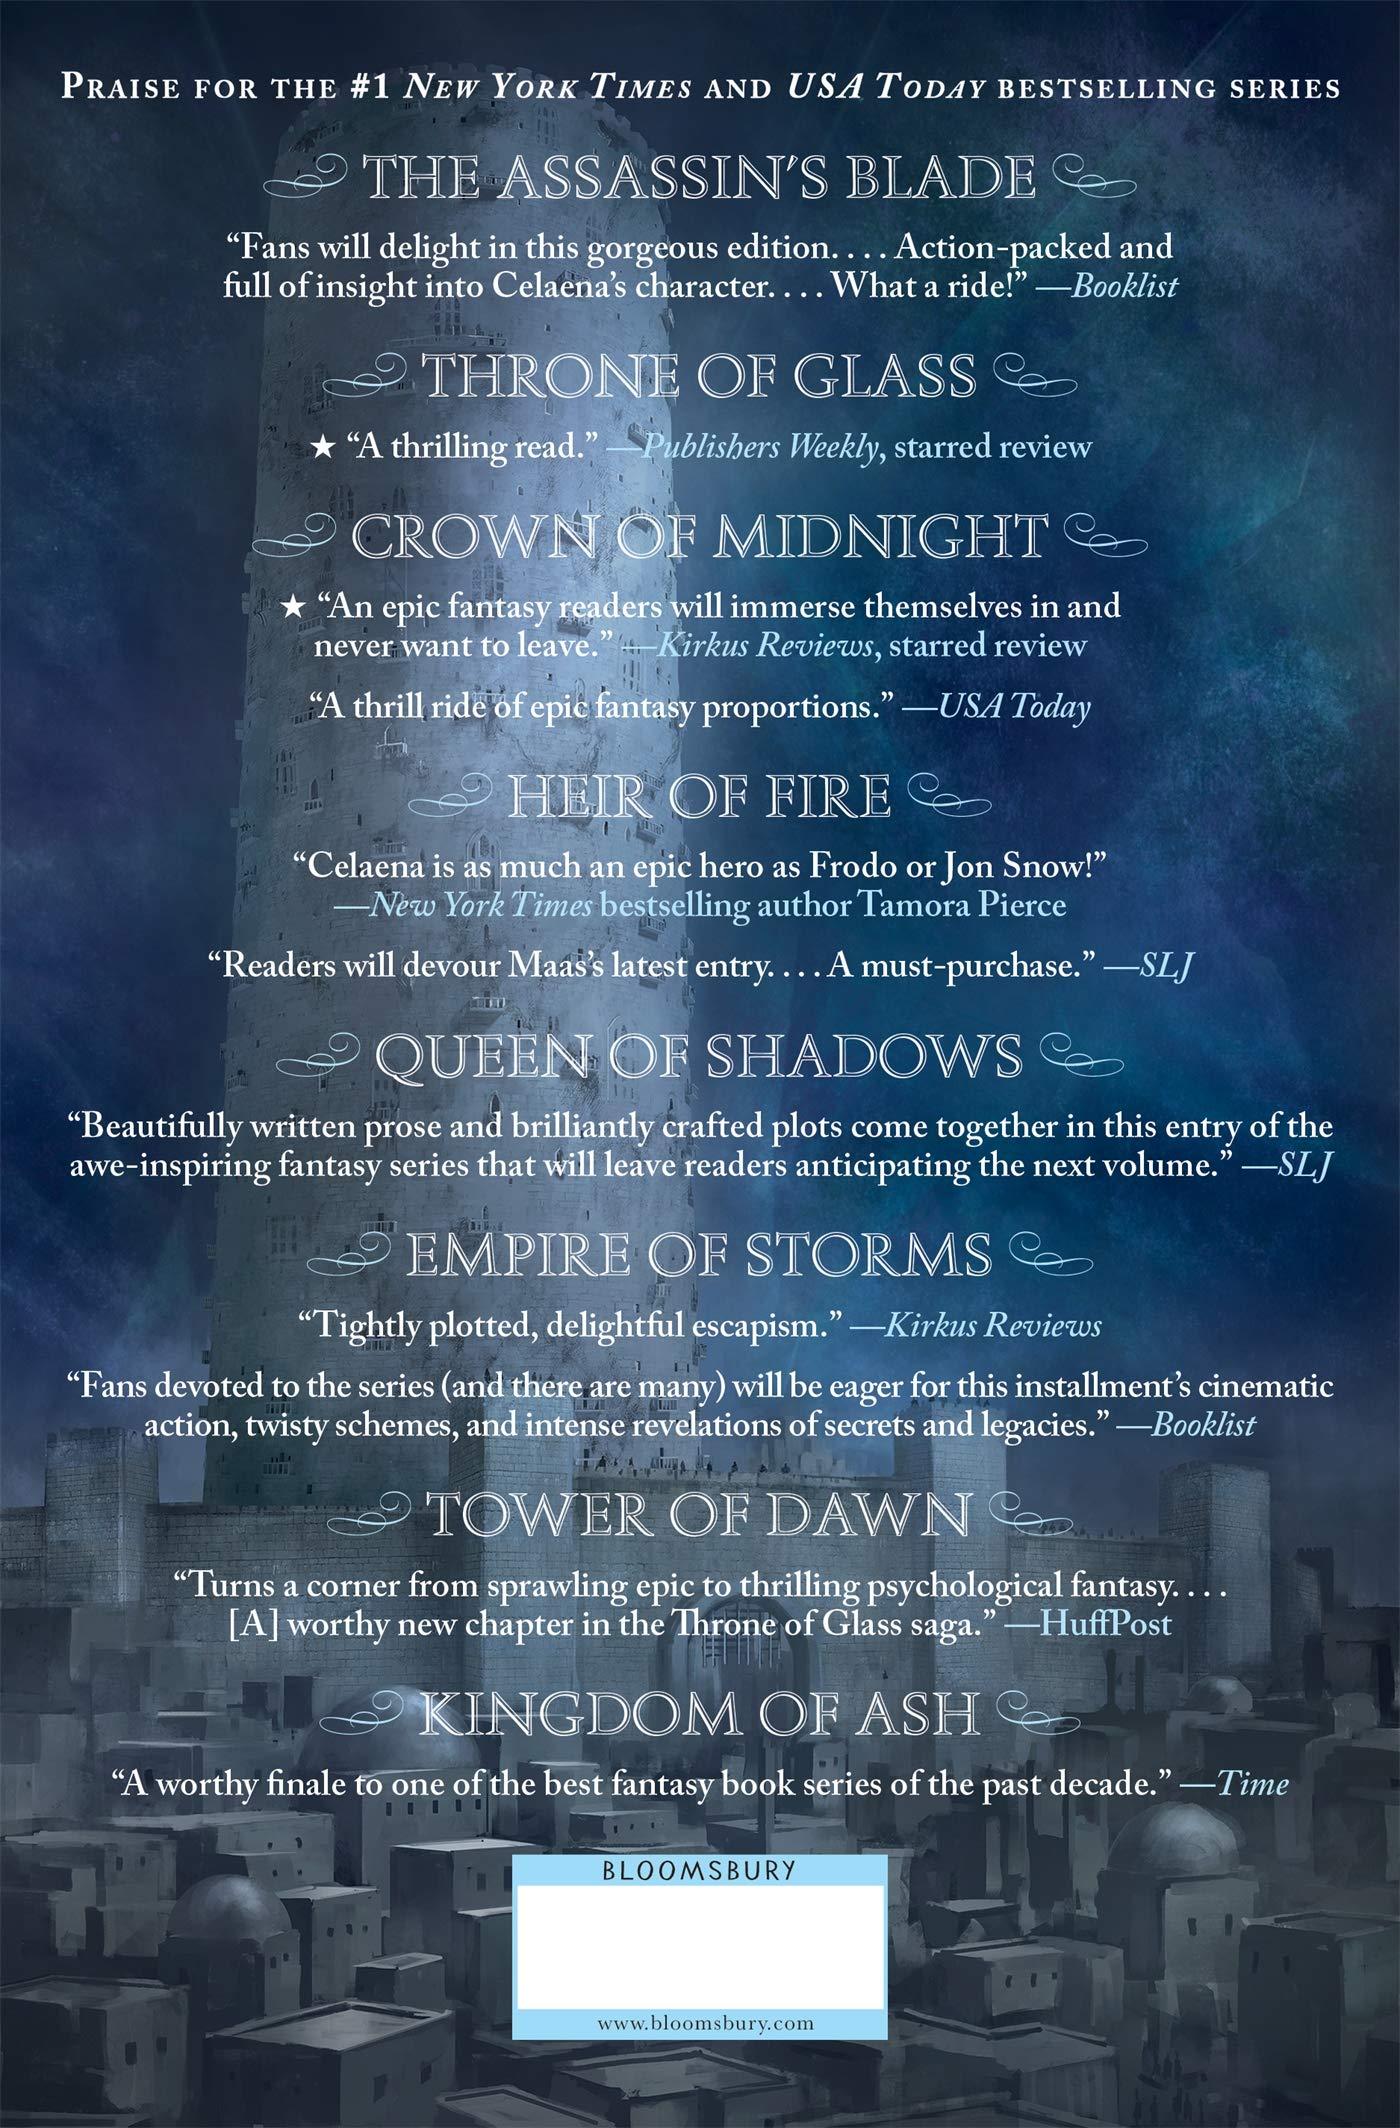 Amazon Com Tower Of Dawn Throne Of Glass Throne Of Glass 6 9781681195773 Maas Sarah J Books